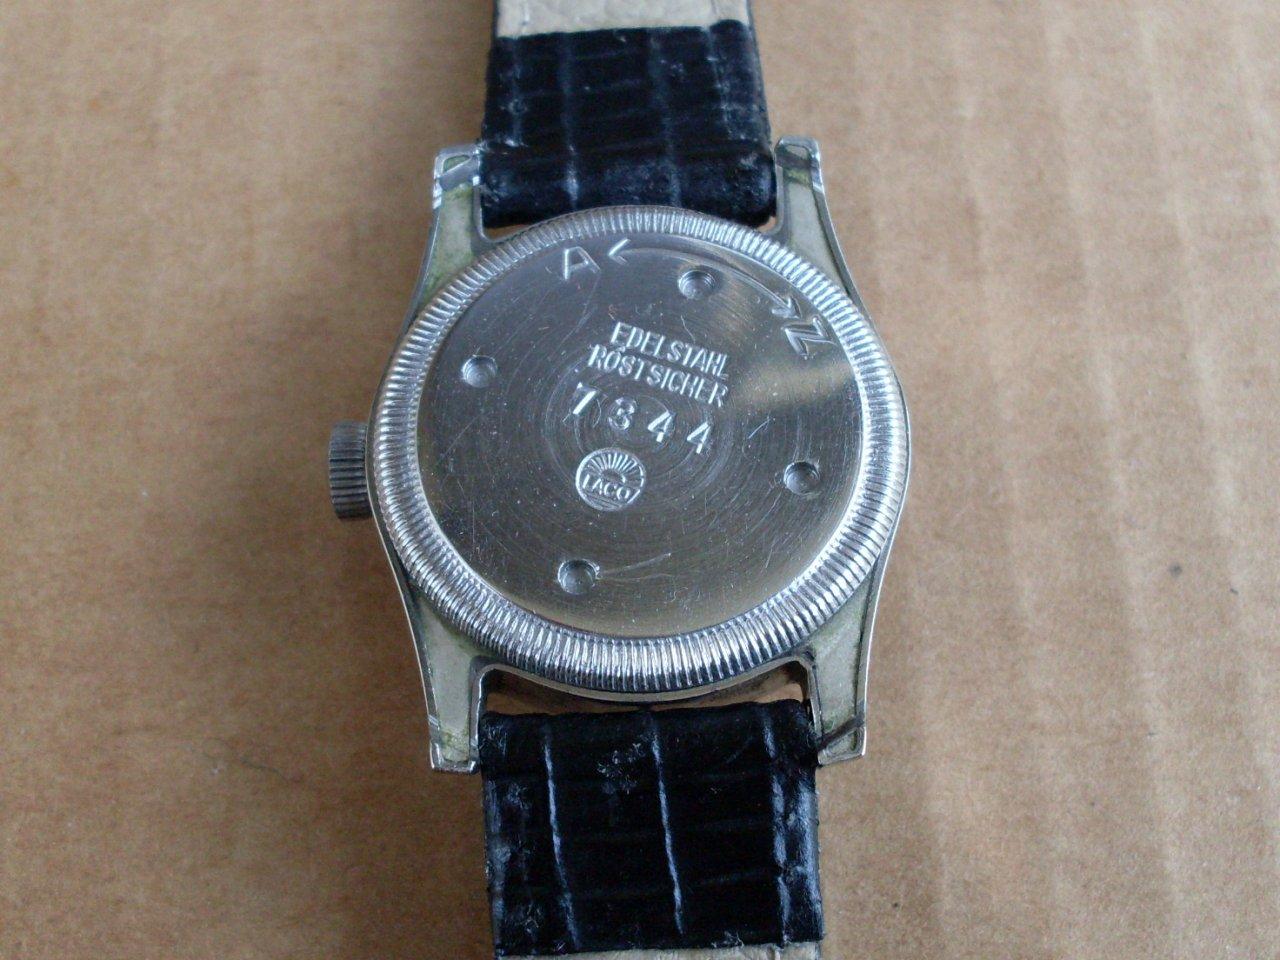 231755d1302115190t-laco-sport-ca-1940-mit-kaliber-laco-526-sdc13409.jpg